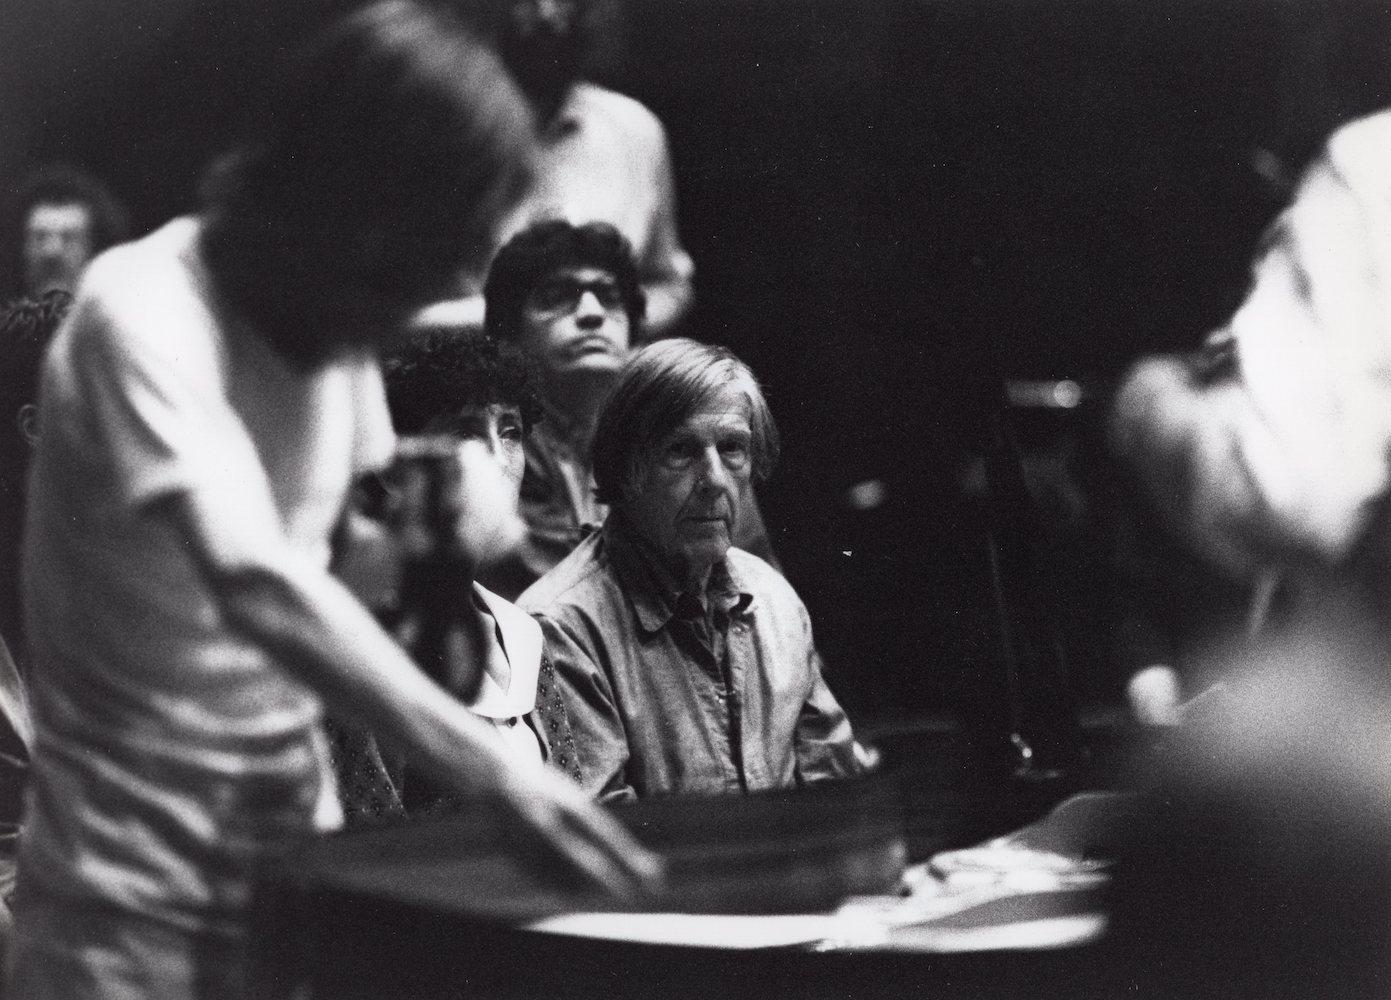 1992, Music Walk b, foto z koncertu v Perugii s Johnom Cageom, 18x24 cm